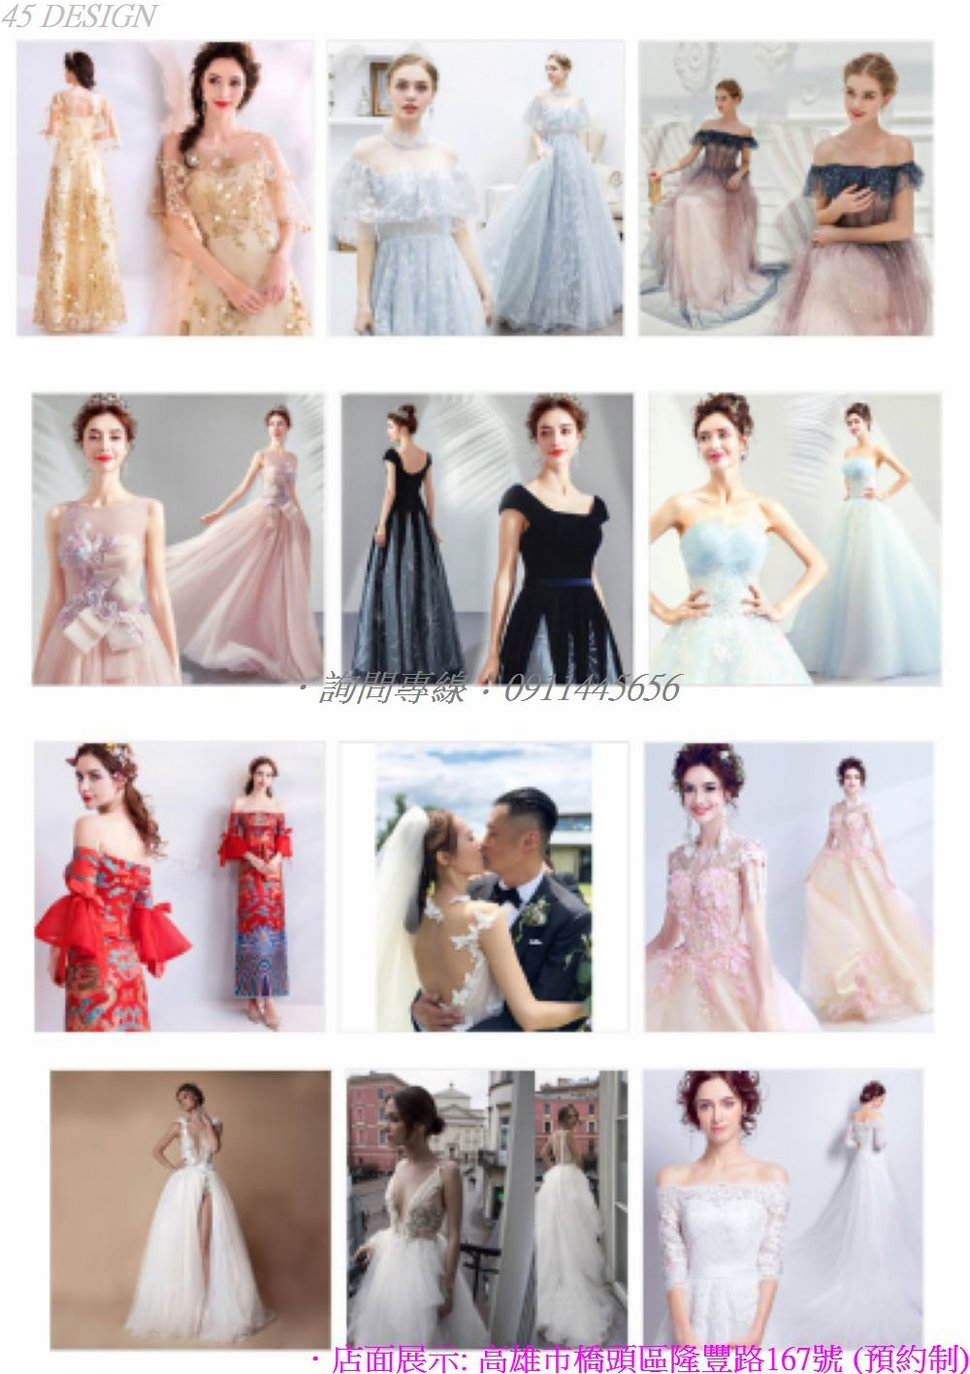 msl190815A38C57001106482F84D09E8ABA881FFA - 全台最便宜-45DESIGN四五婚紗禮服《結婚吧》